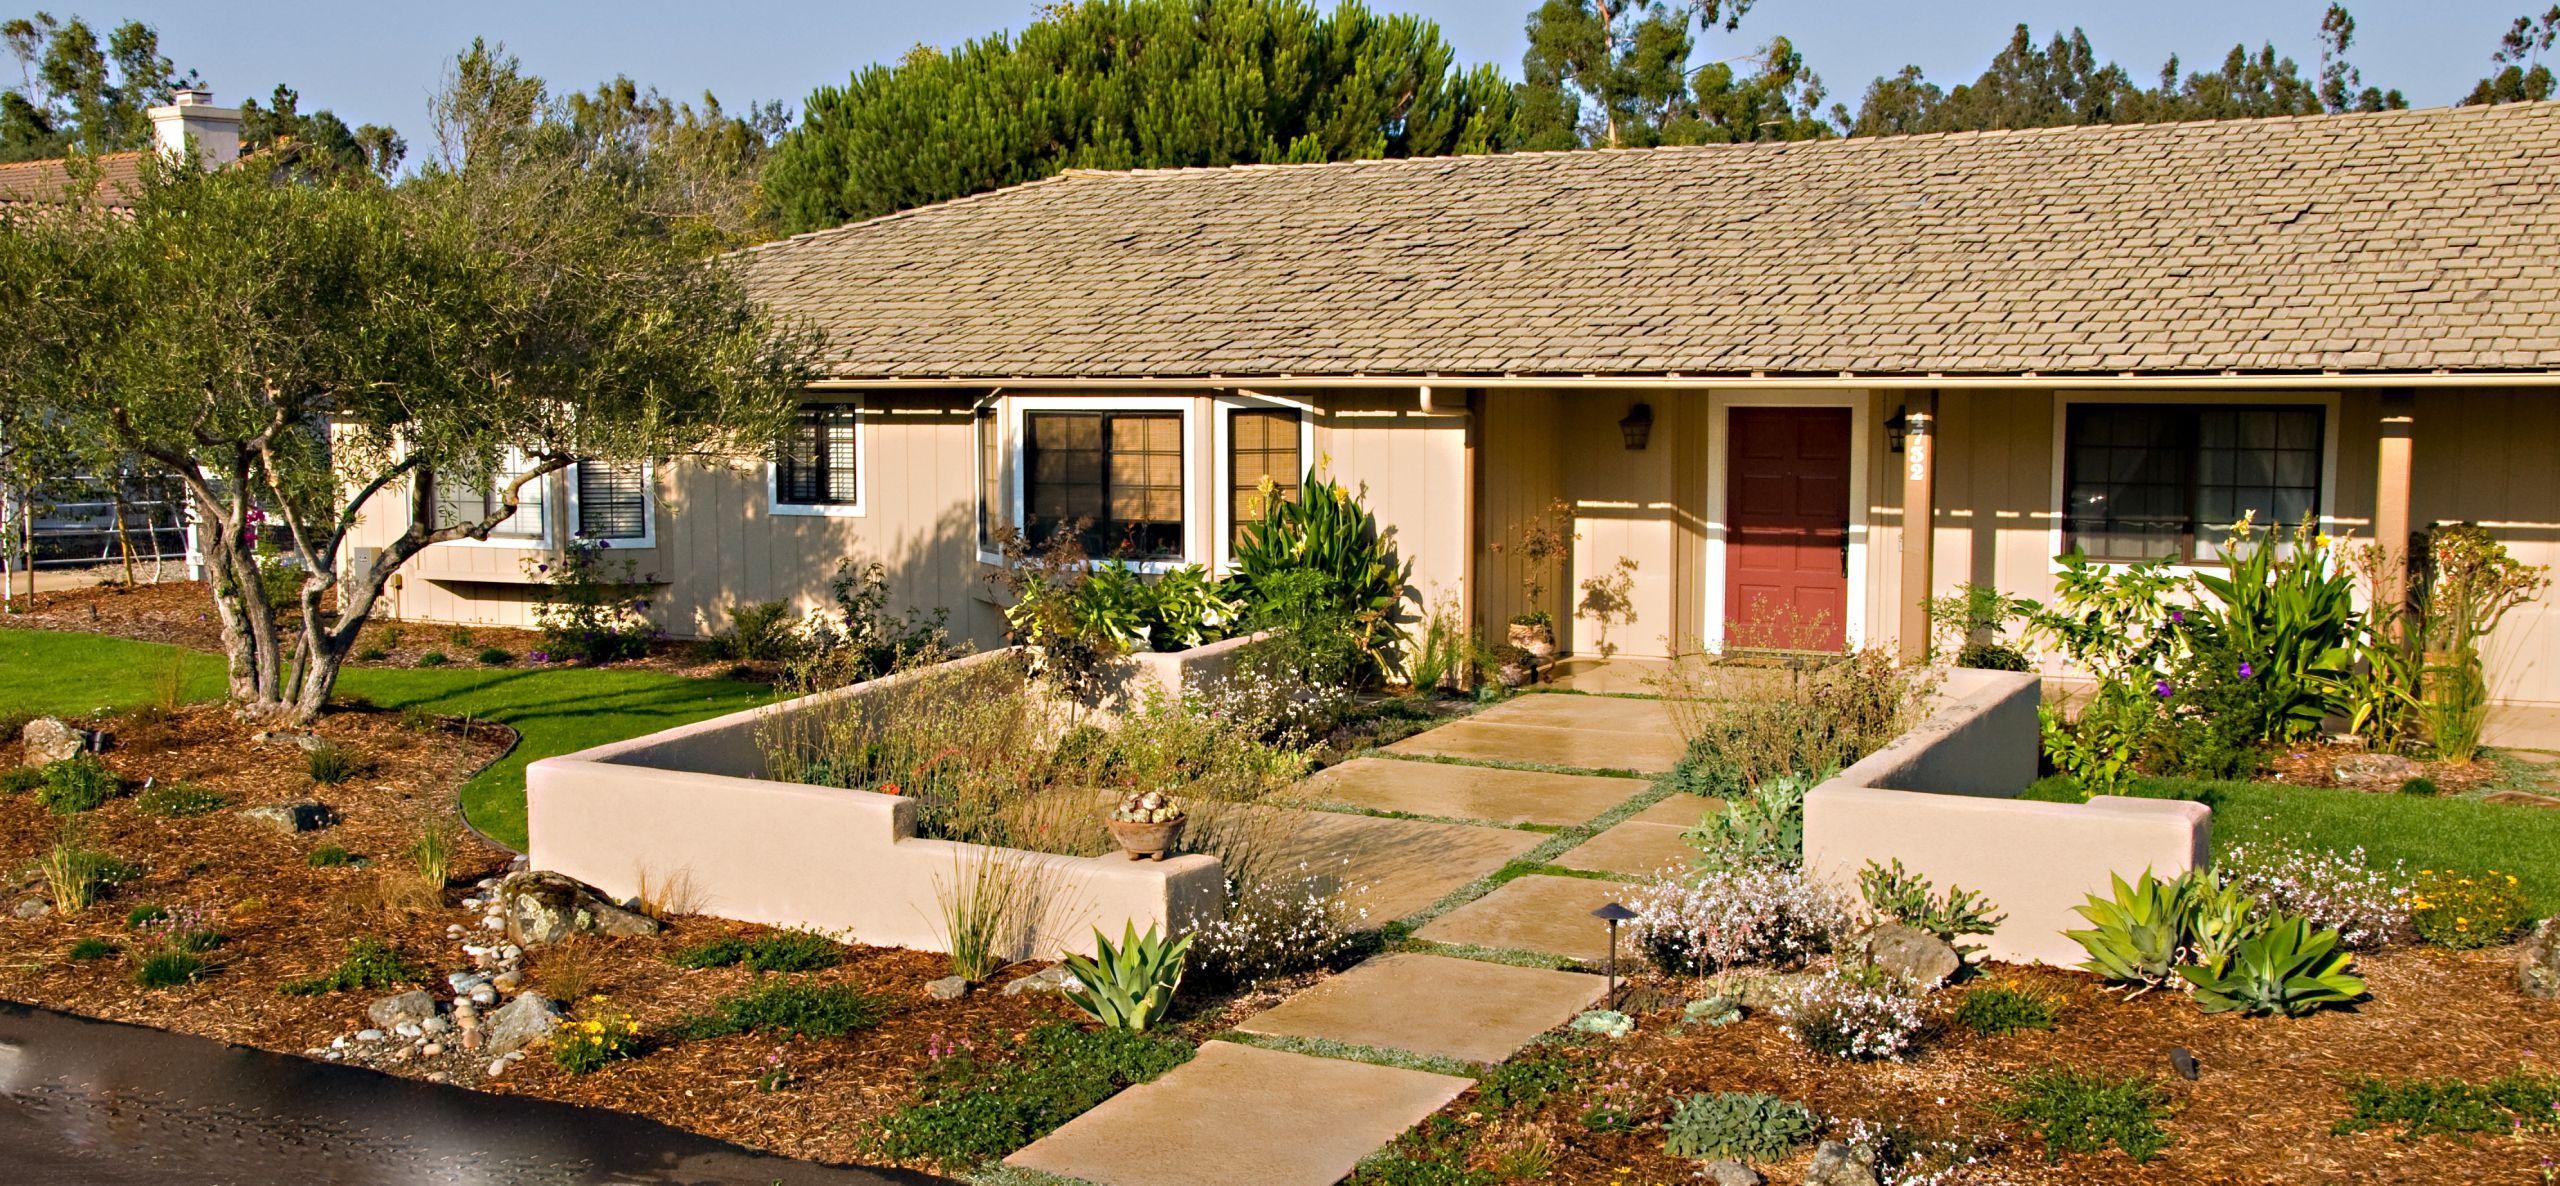 Residential Landscape Design  OC West Landscape Design & Construction